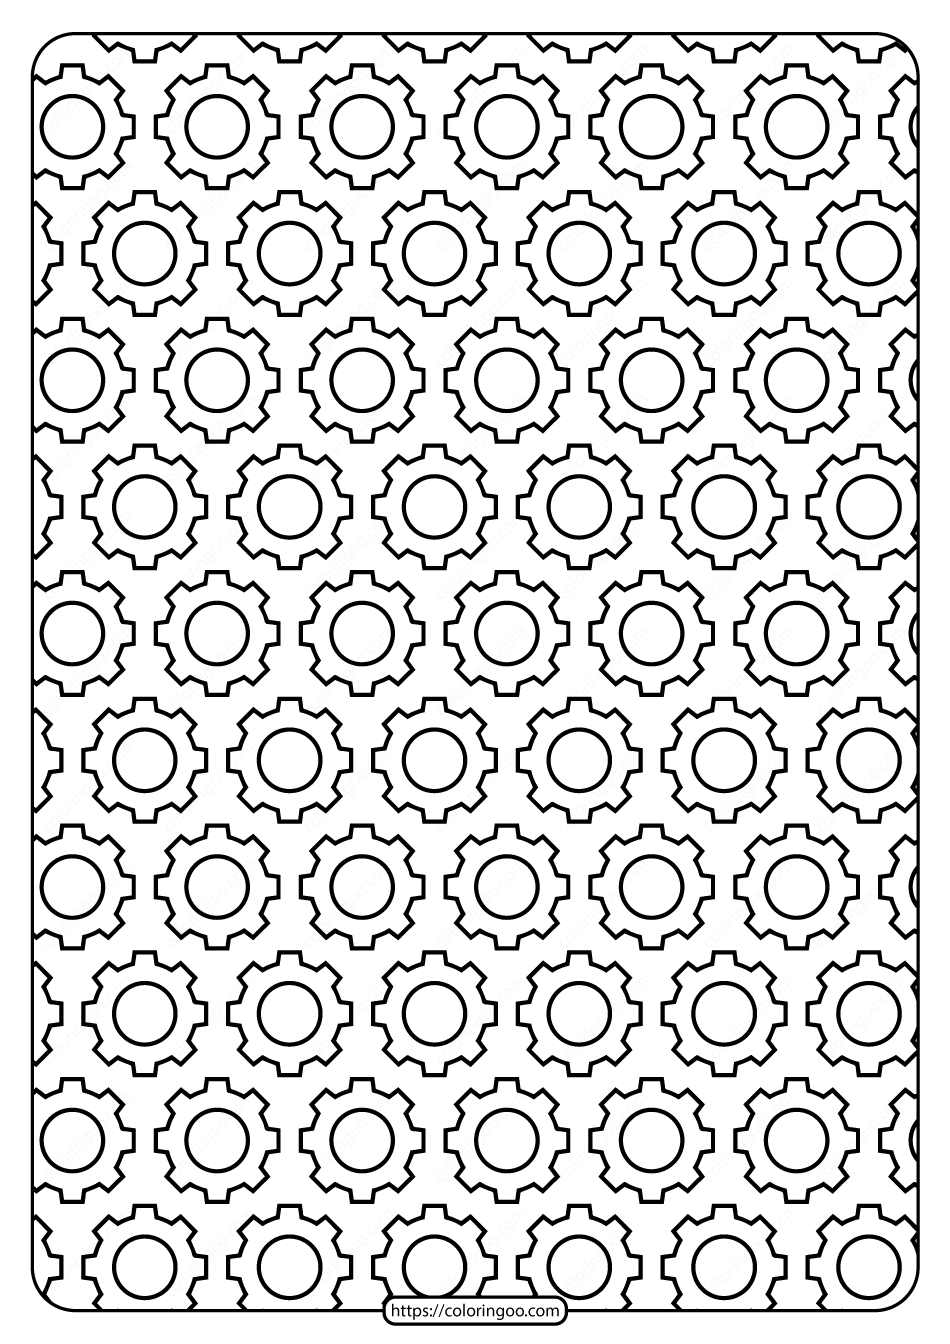 Free Printable Gear Outline Pdf Patterns 02